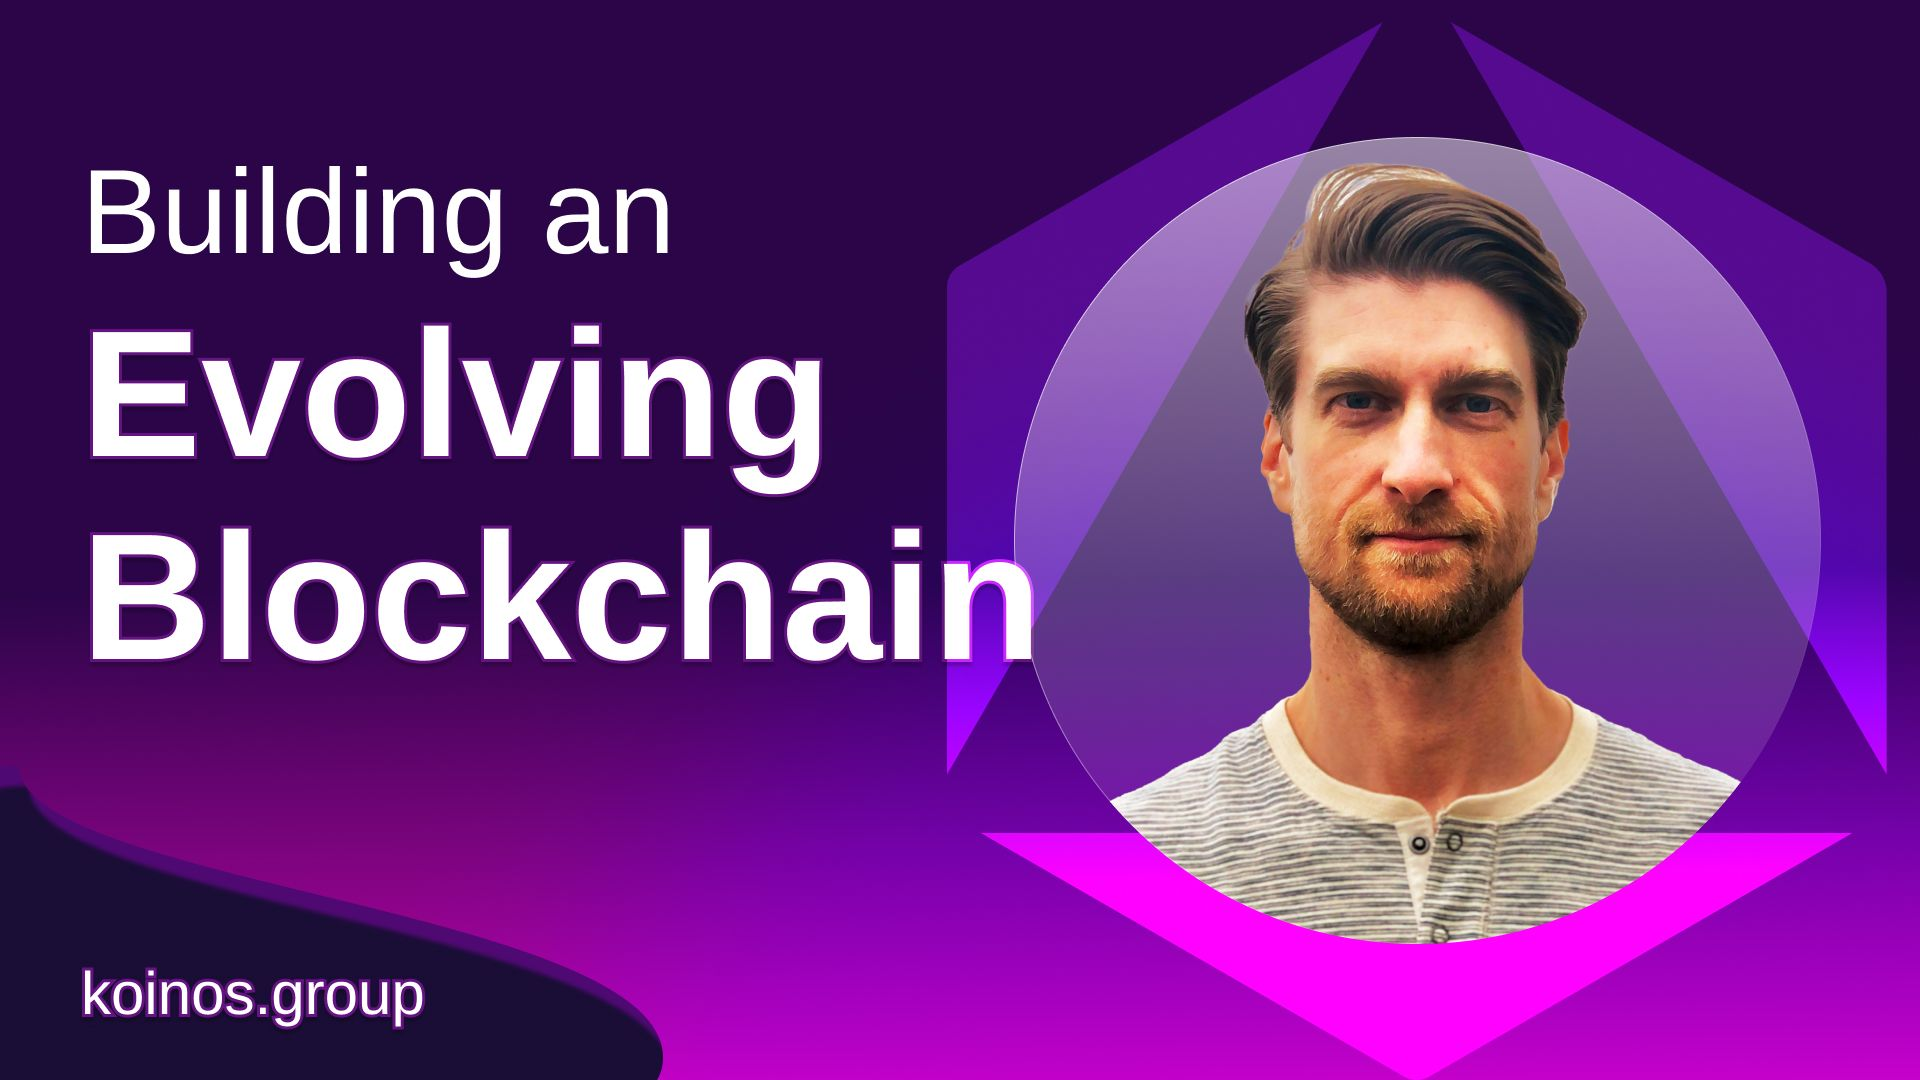 <bold>How</bold> We're <bold>Building</bold> an EVOLVING <bold>Blockchain</bold>